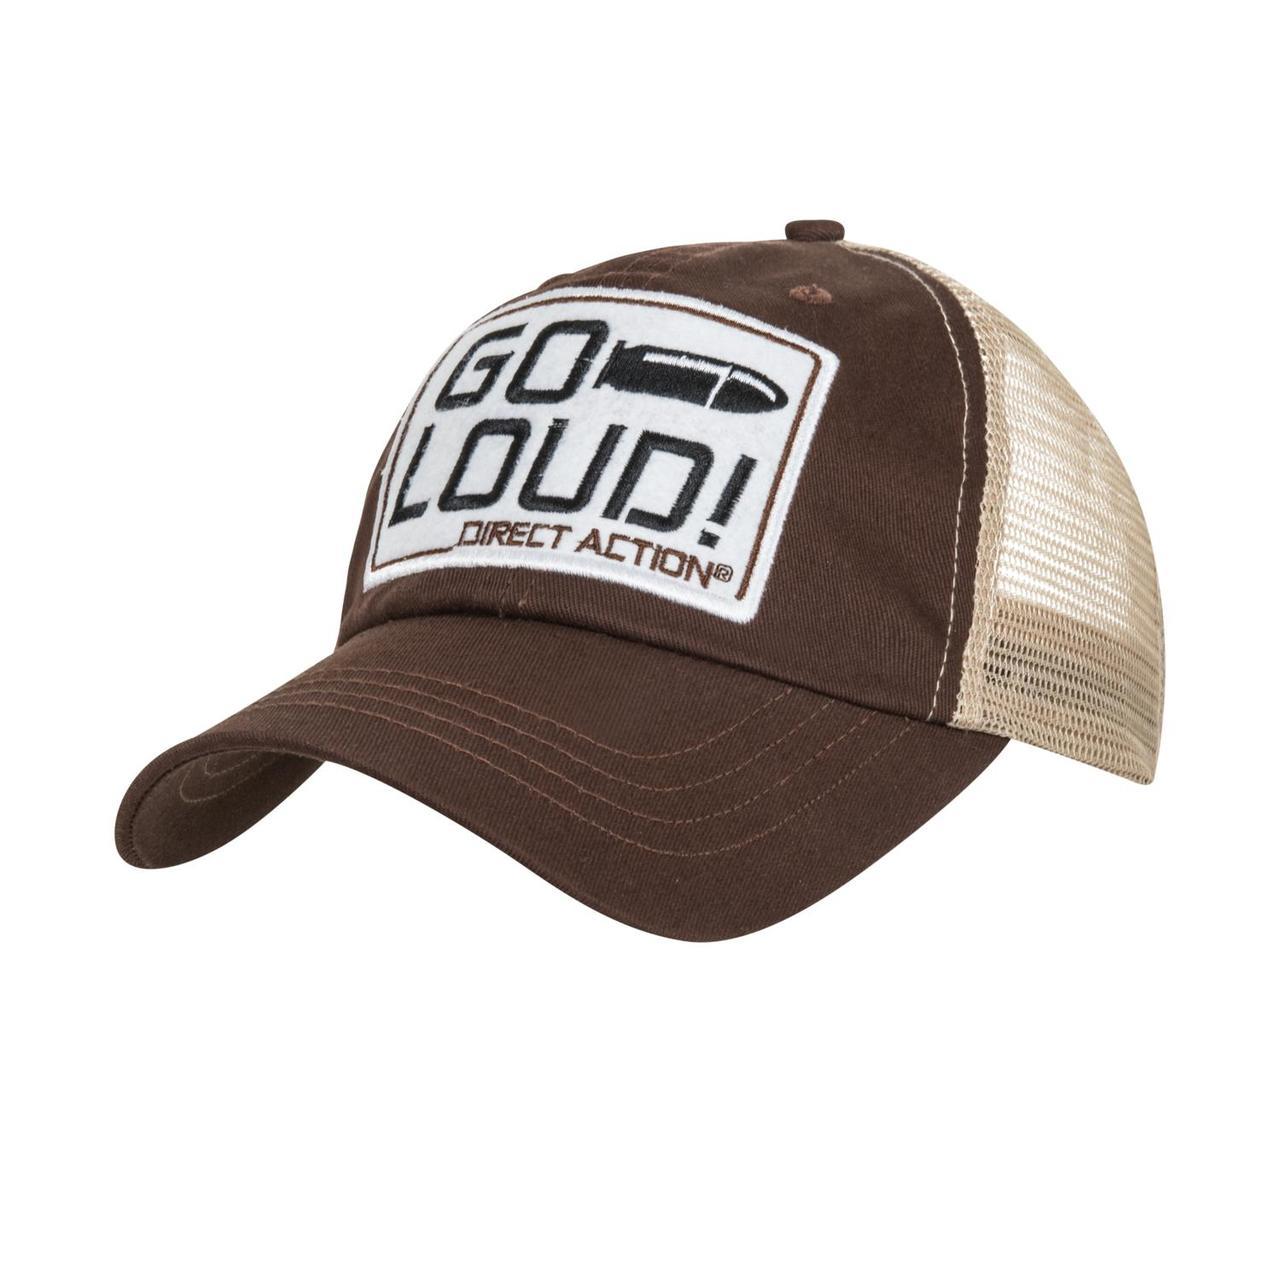 Бейсболка летняя Direct Action® GO LOUD!® Feed Cap - Brown